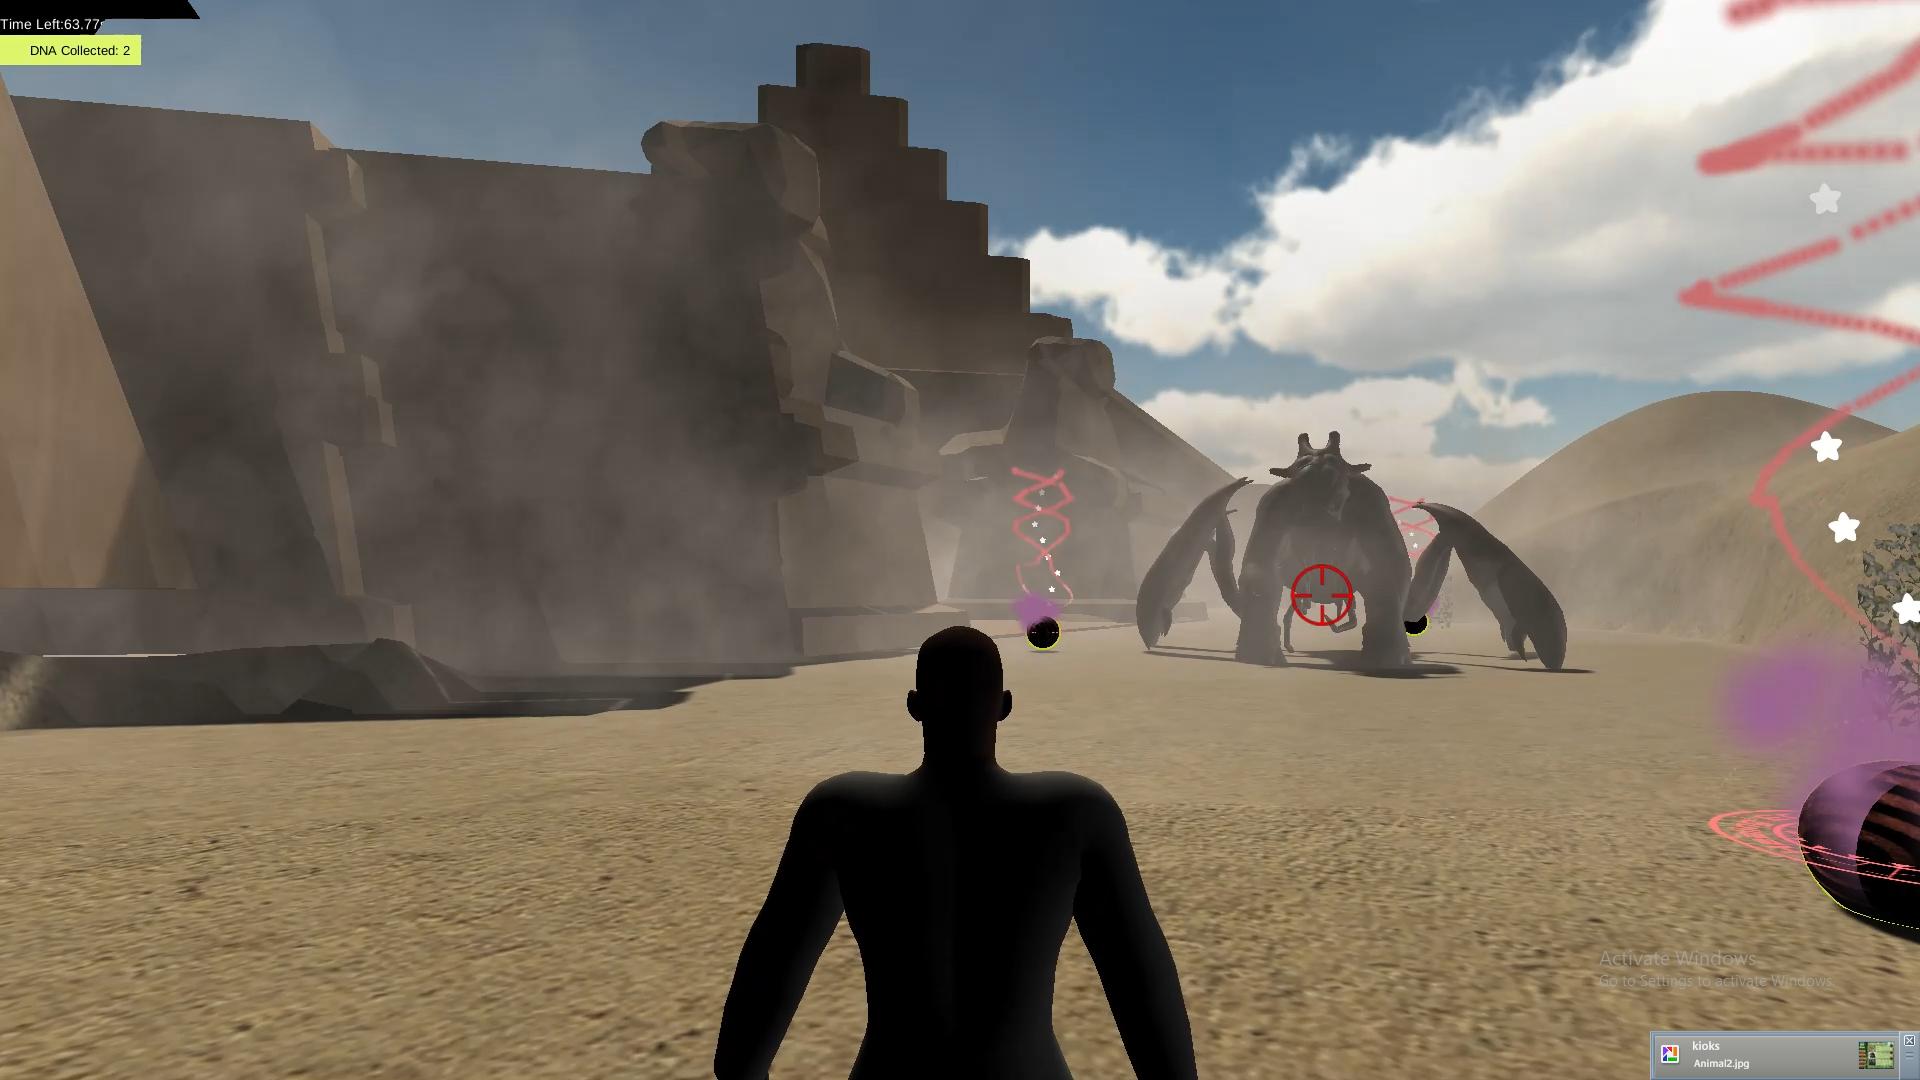 Escape from Planet Macrocosm